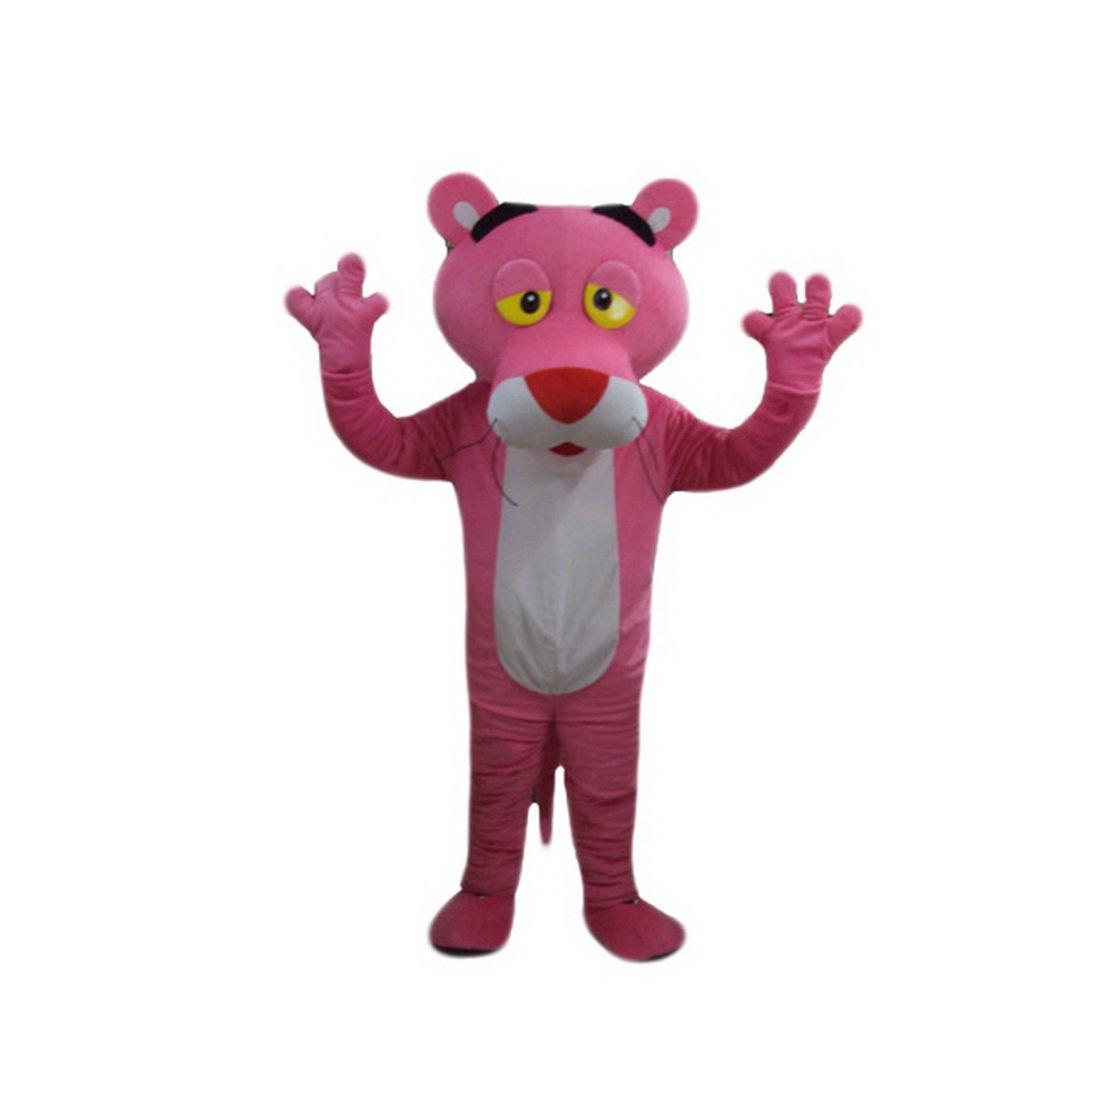 Kooplus Pink Panther Mascot Costume Cartoon Costume by Kooplus